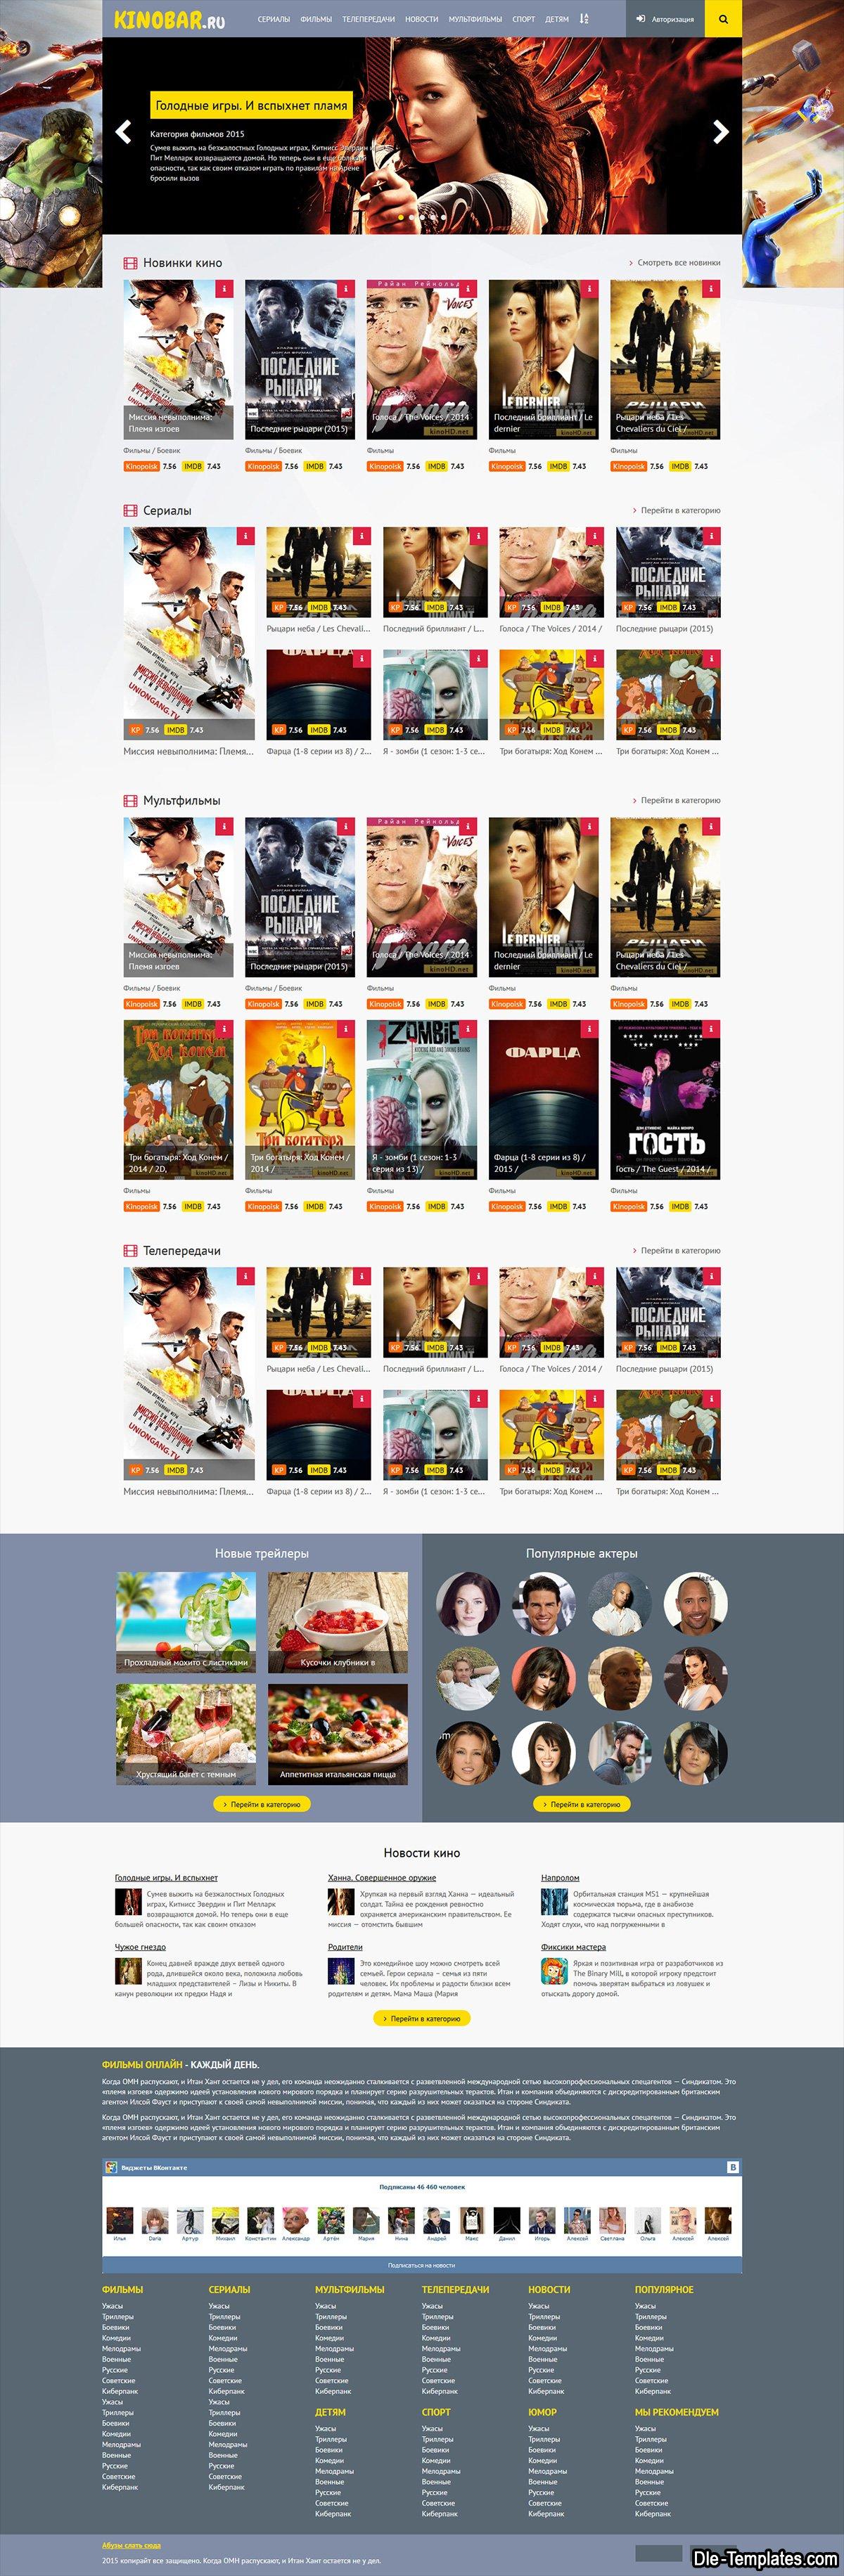 KinoBar - адаптивный шаблон для киносайтов на DLE | Pinterest | Template